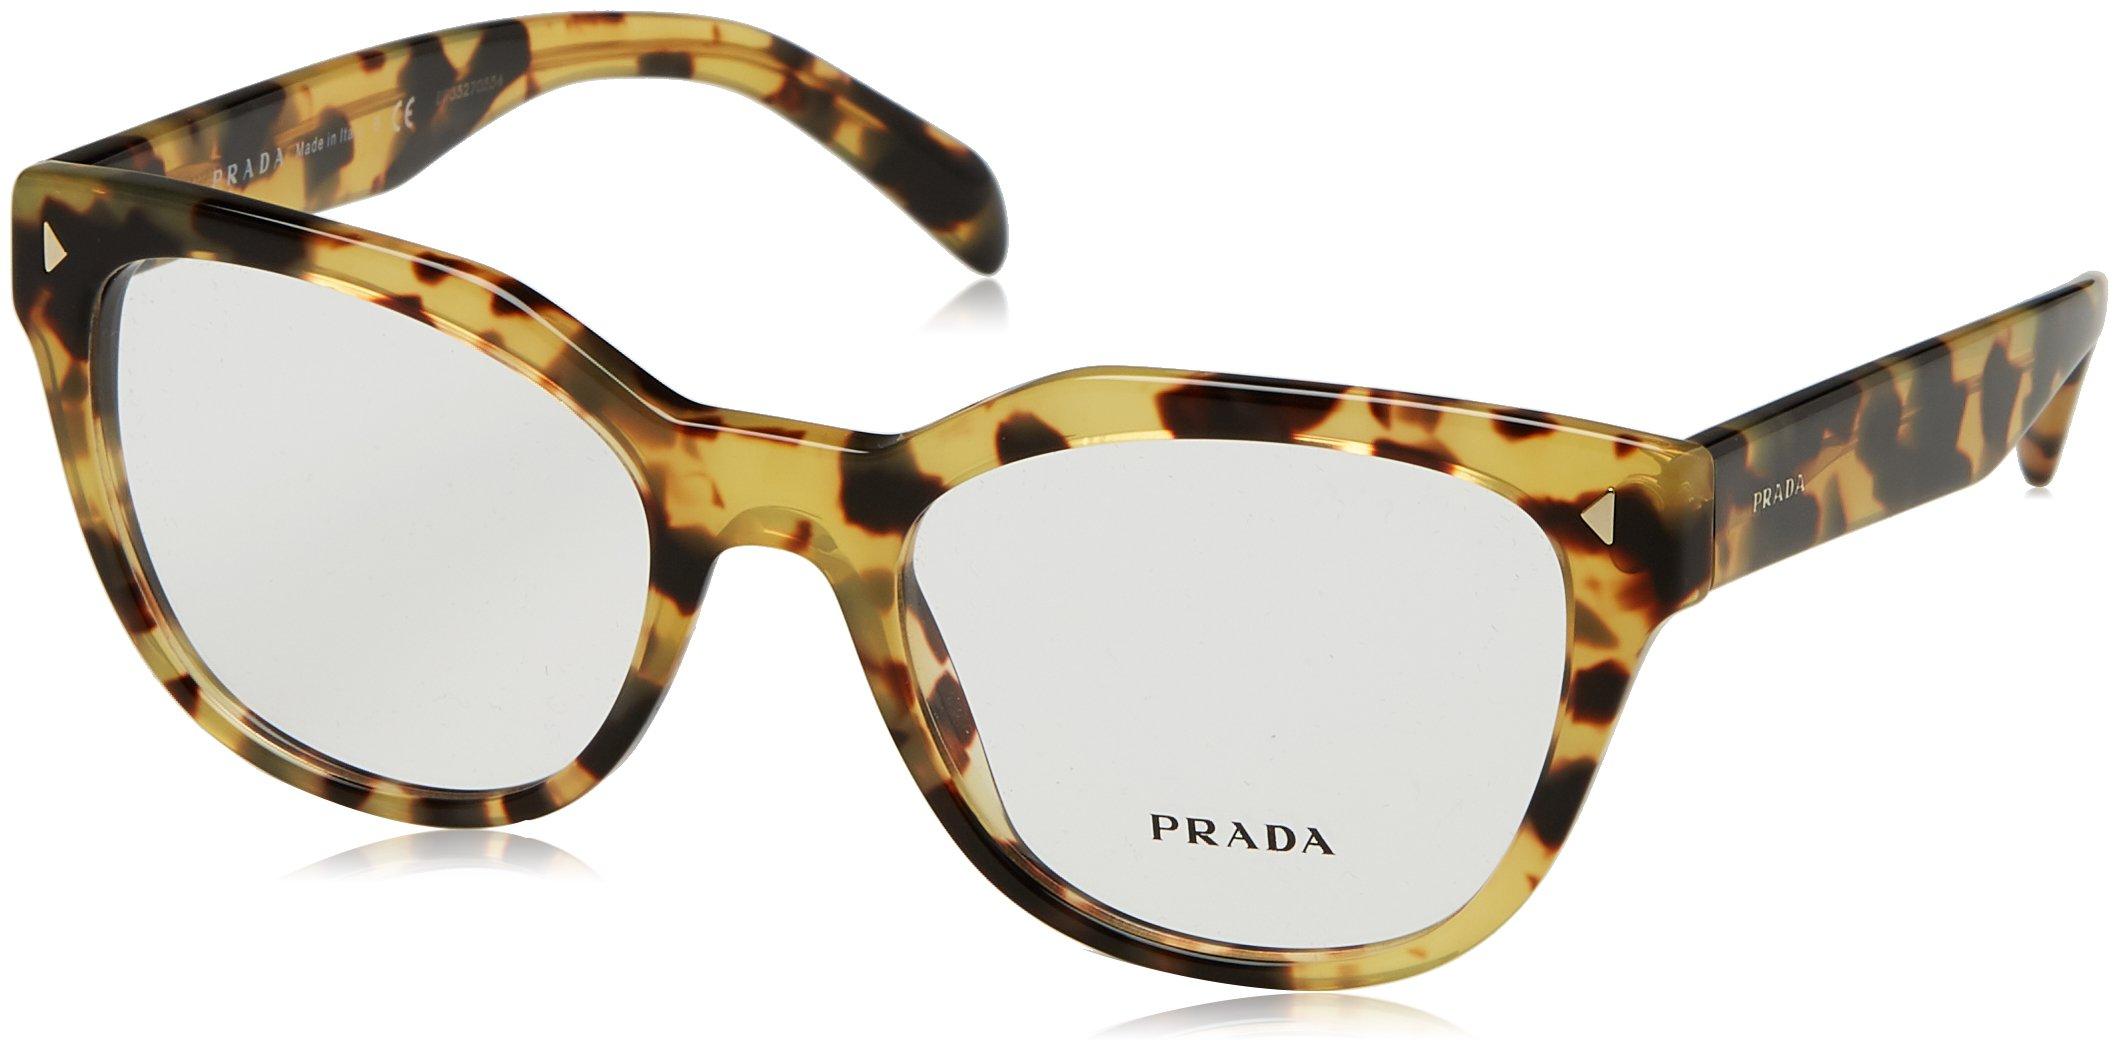 Prada PR21SV Eyeglass Frames 7S01O1-53 - Medium Havana PR21SV-7S01O1-53